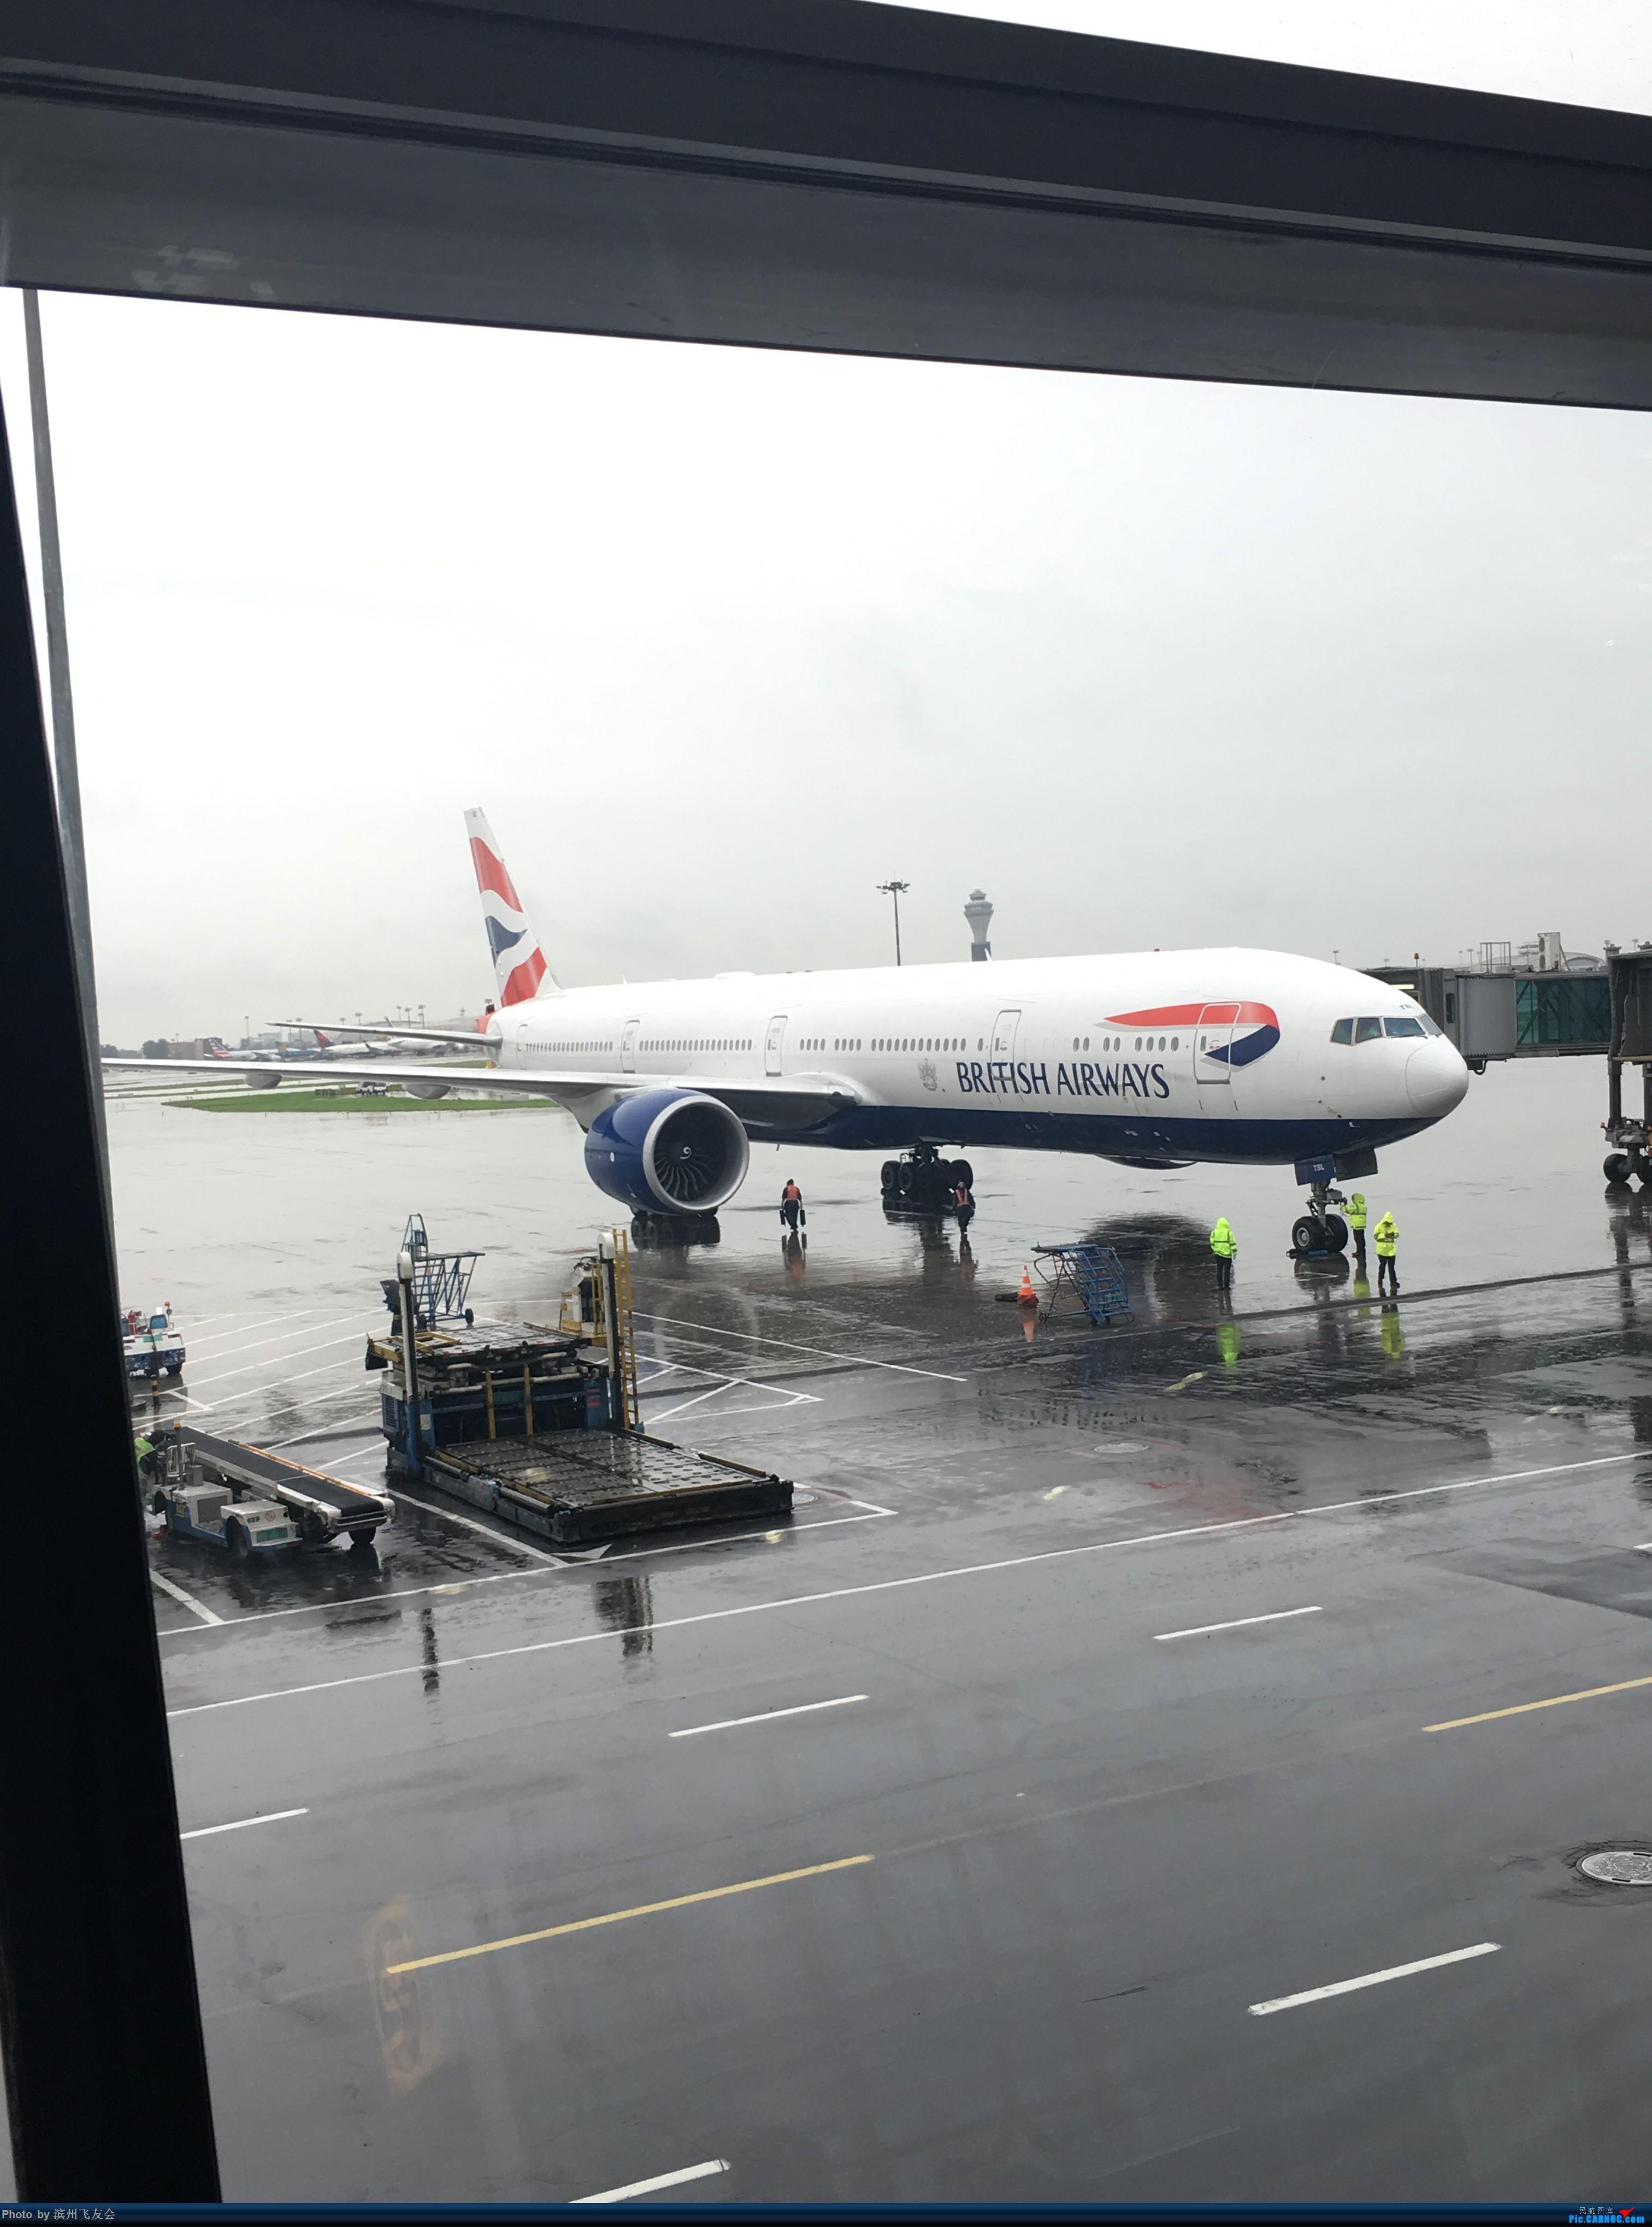 Re:[原创]~骚年飞行篇~补充半年前的香港之路,国航CA111 PEK-HKG,有幸坐到大擦第50架77W BOEING 777-300ER G-STBL 中国北京首都国际机场